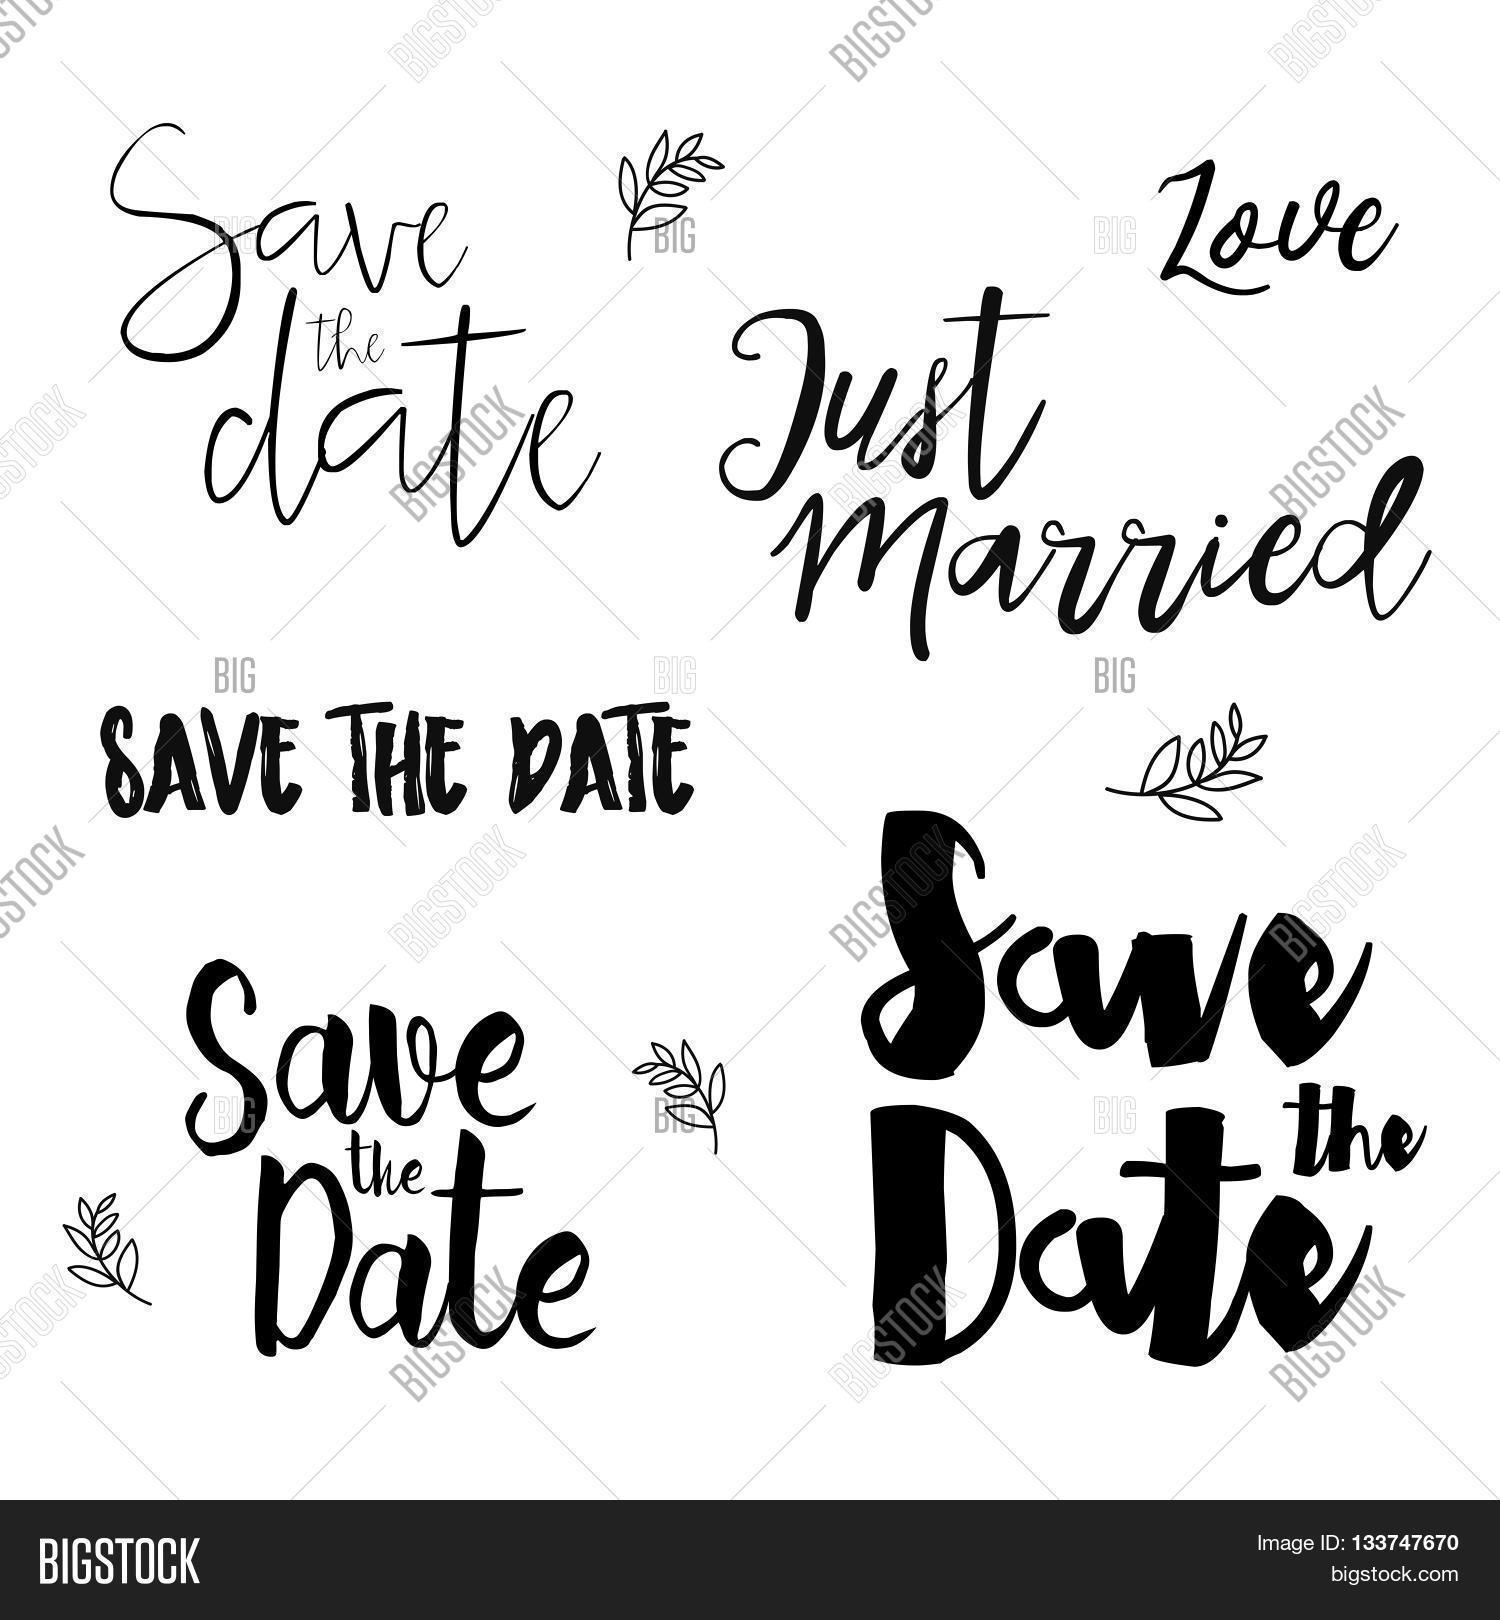 save date wedding vector photo free trial bigstock